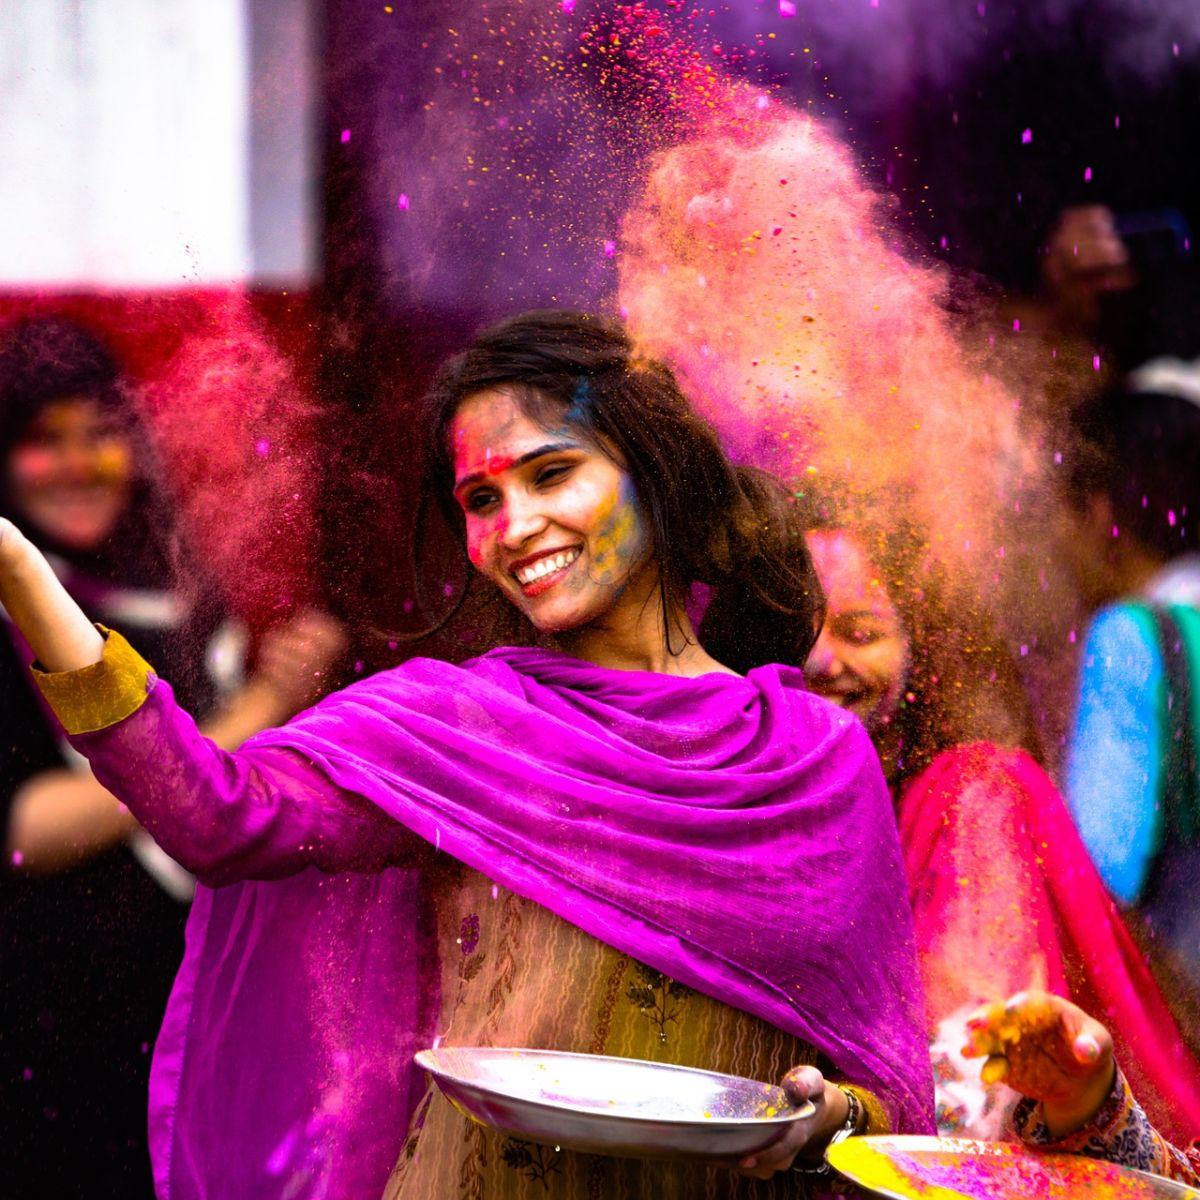 Indian girl full of color at Holi festival